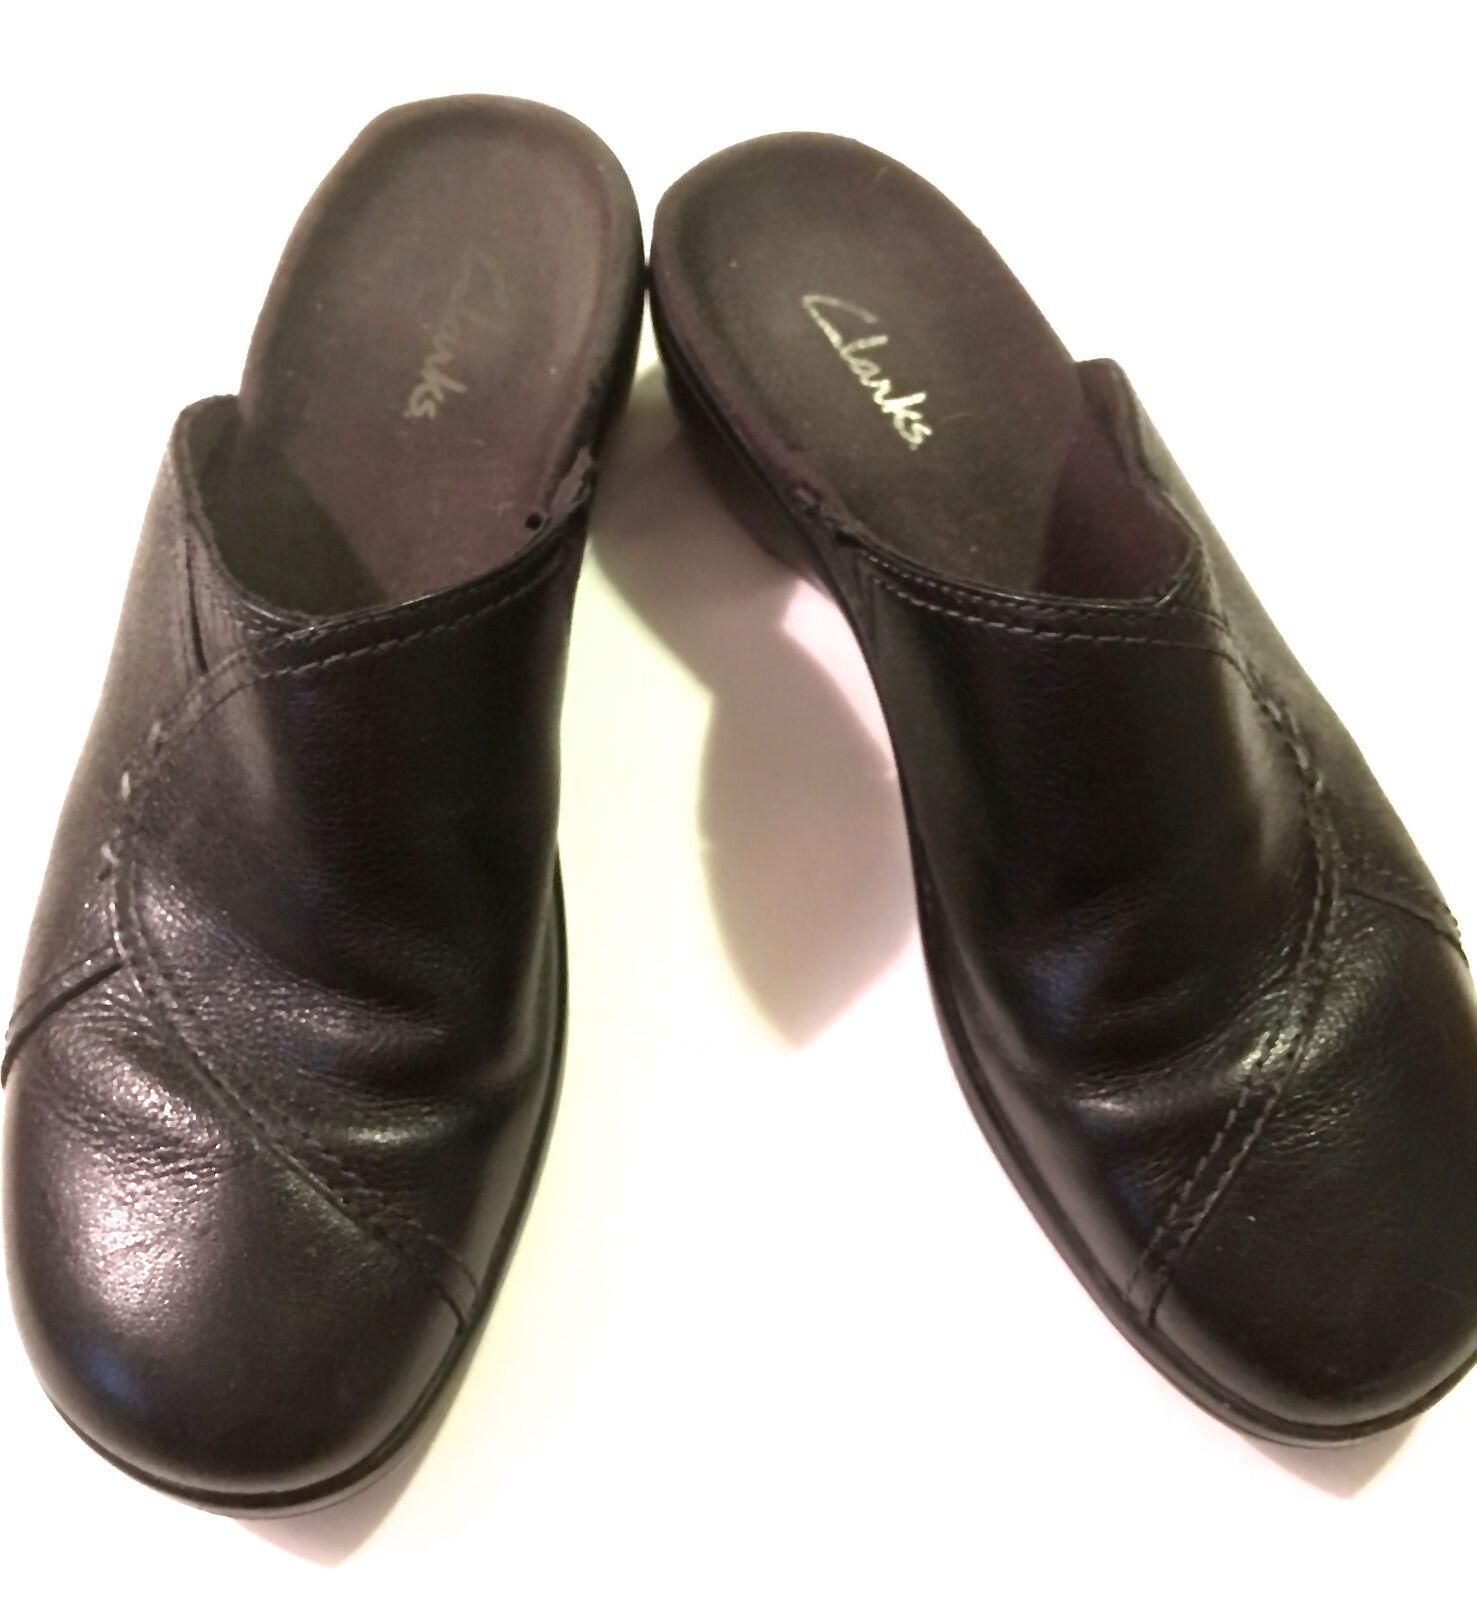 Clarks Black Leather Mules, Slides, 7.5M, Comfort Ultra Soft Leather, Cushioned Comfort 7.5M, 3c865e